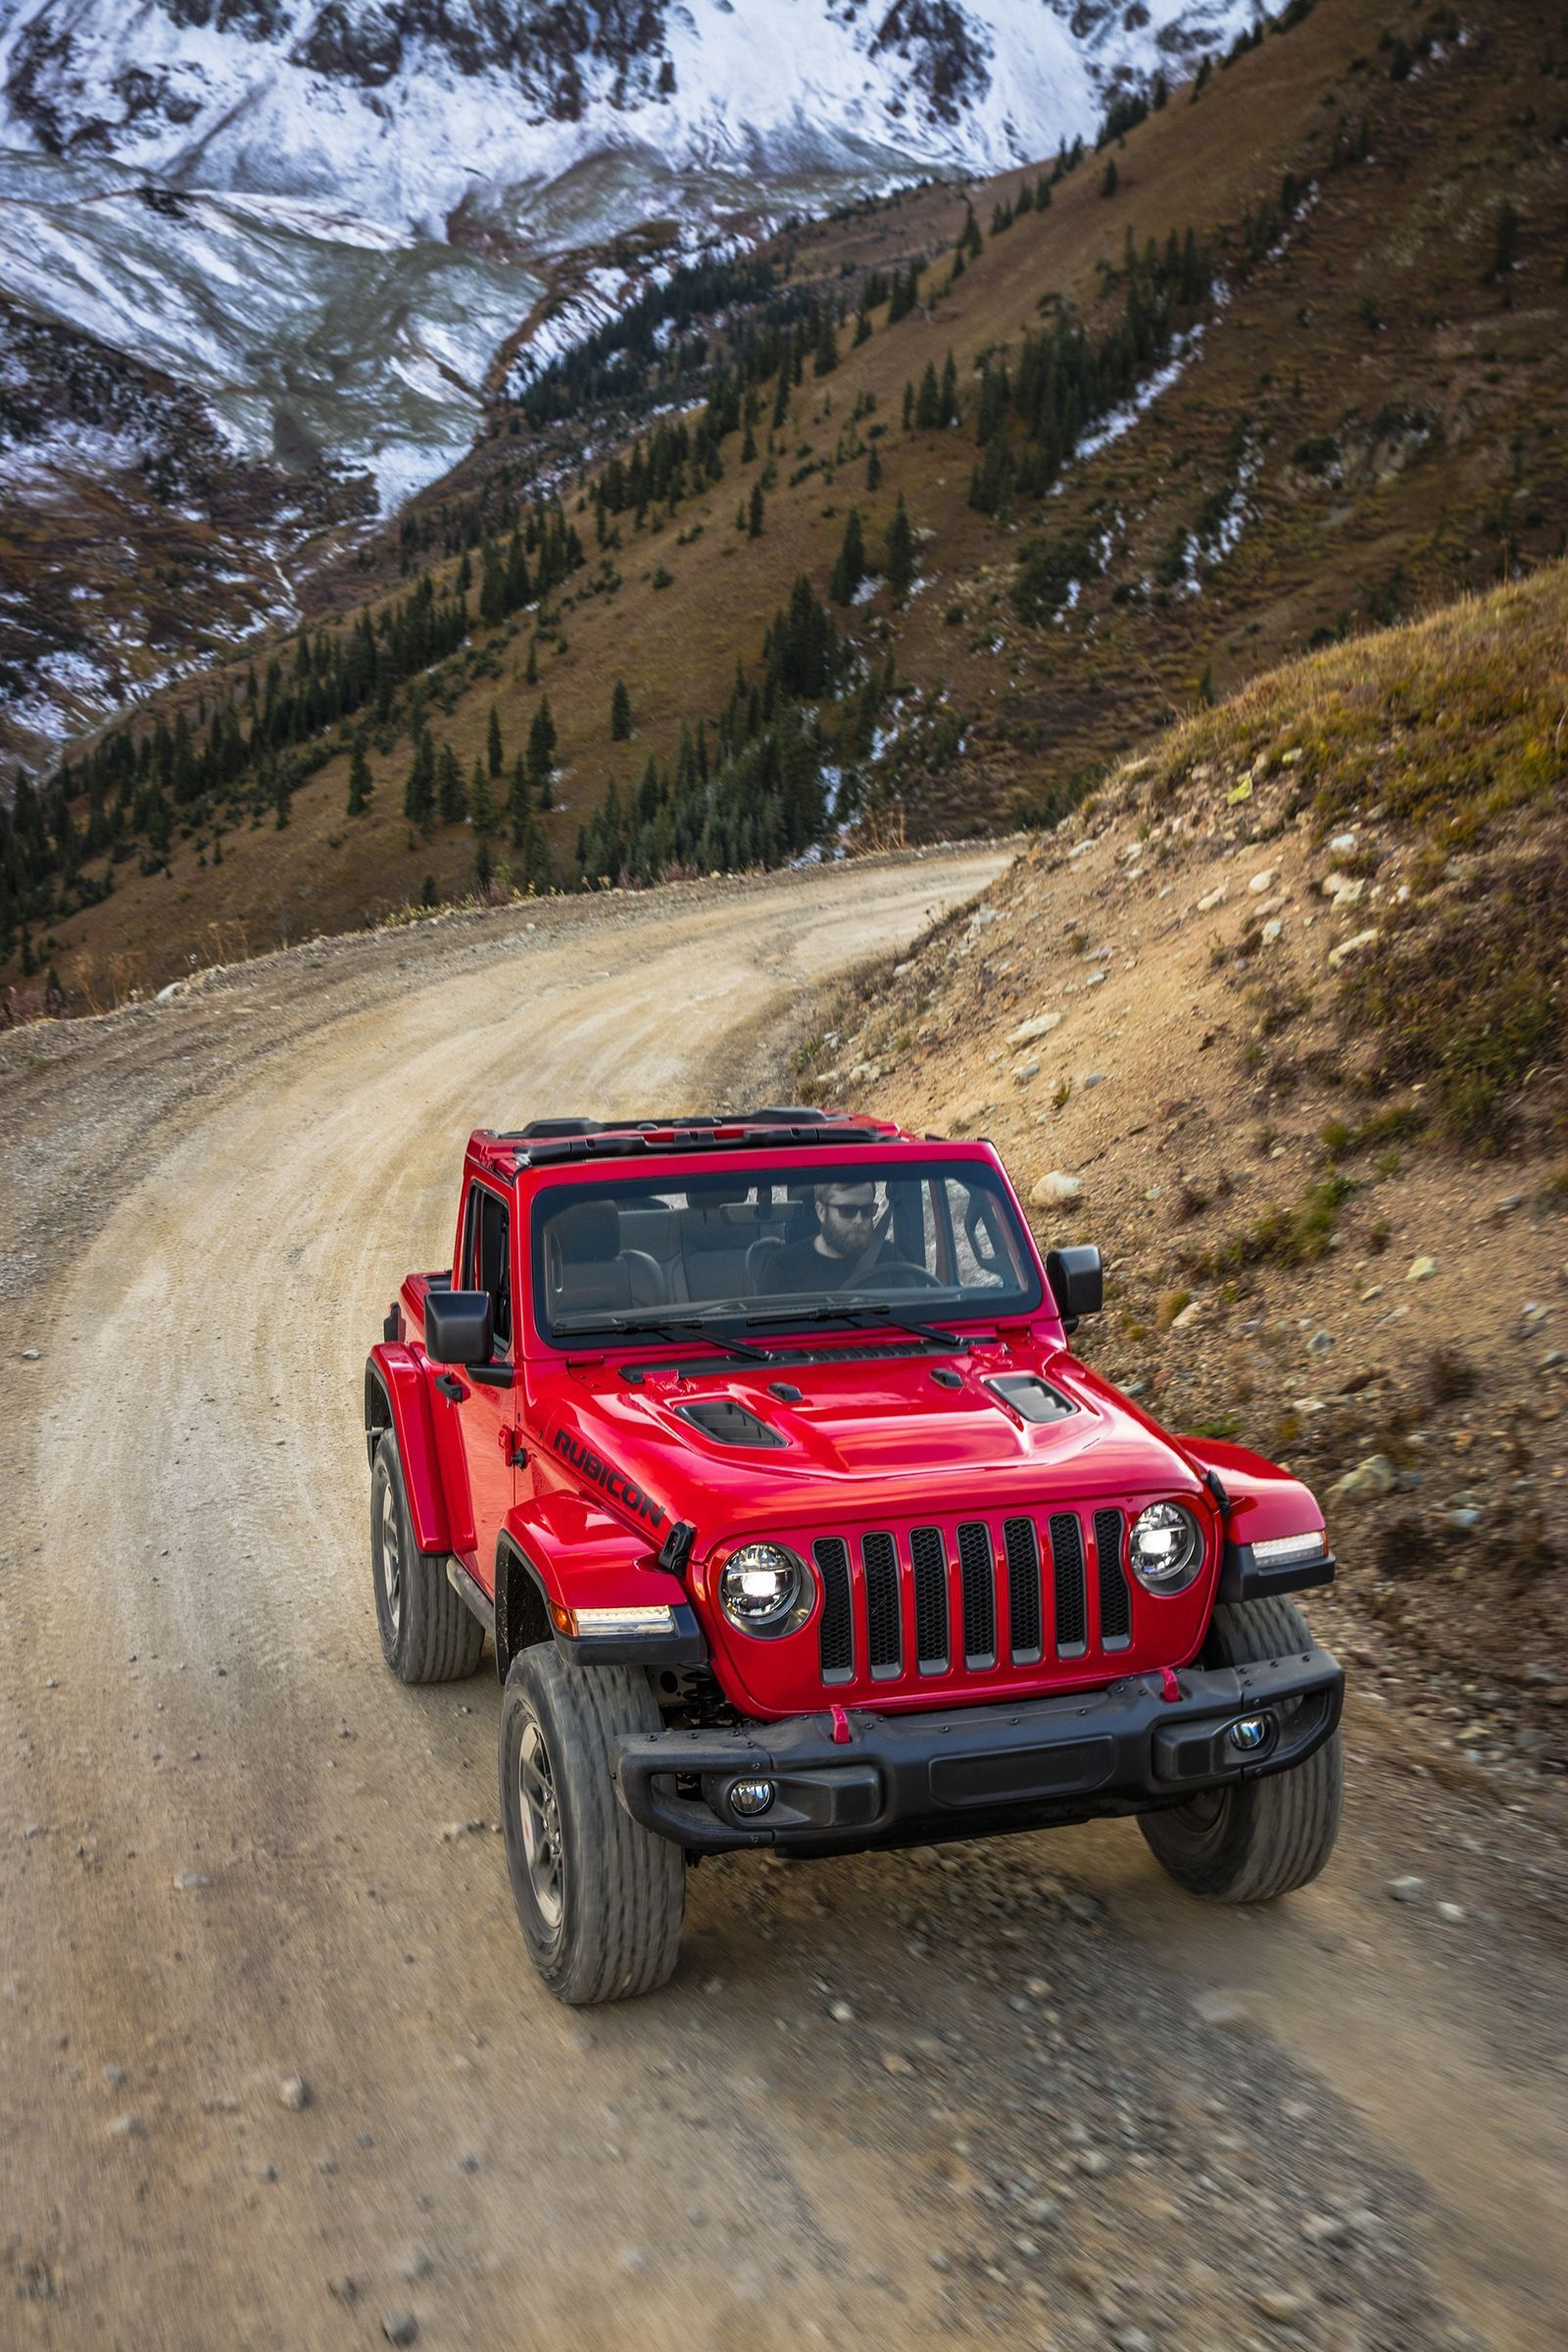 2018 Jeep Wrangler Mega Photo Gallery Jeep wrangler